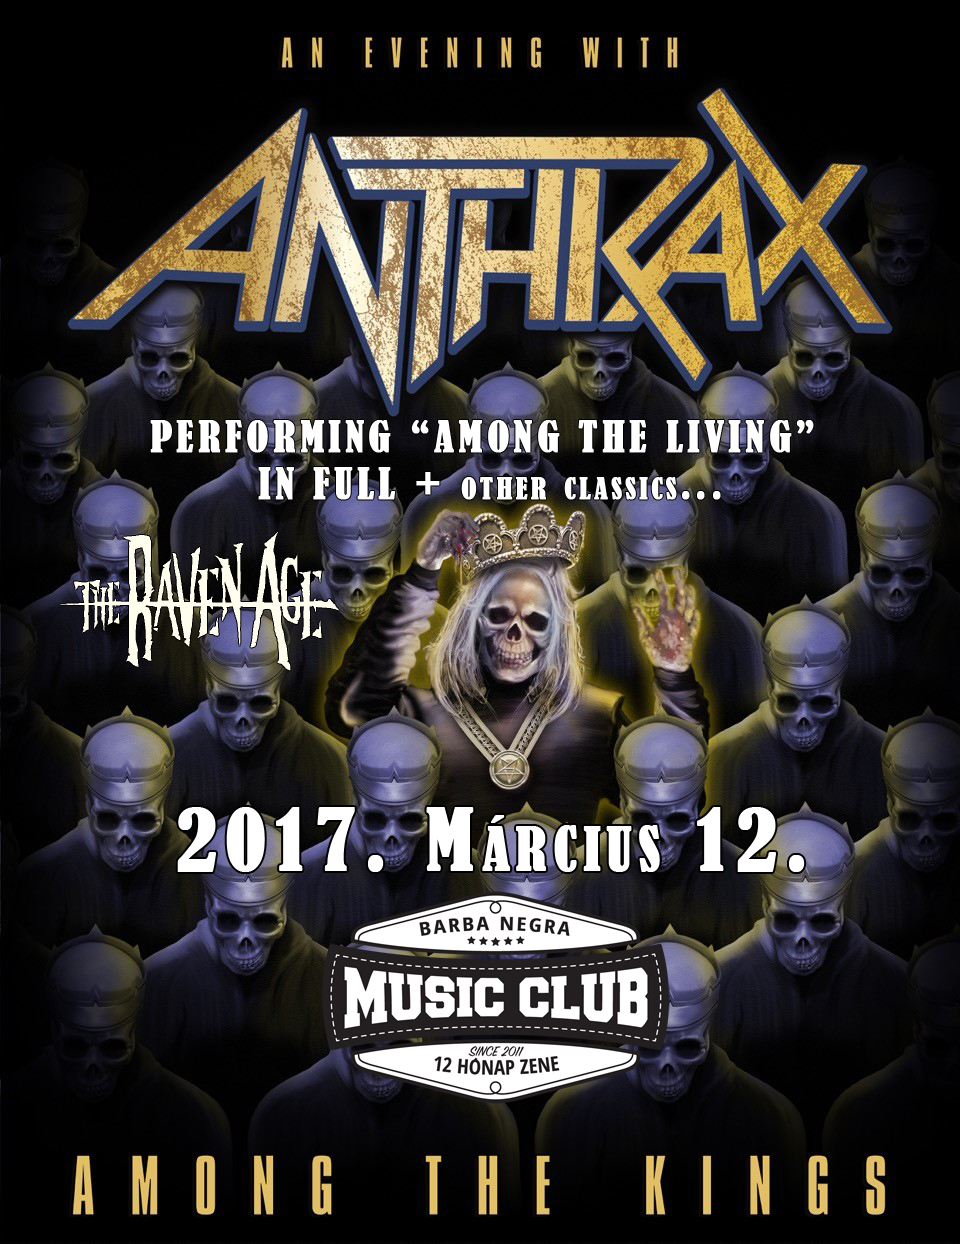 ANTHRAX koncert – 2017. március 12. – Barba Negra Music Club